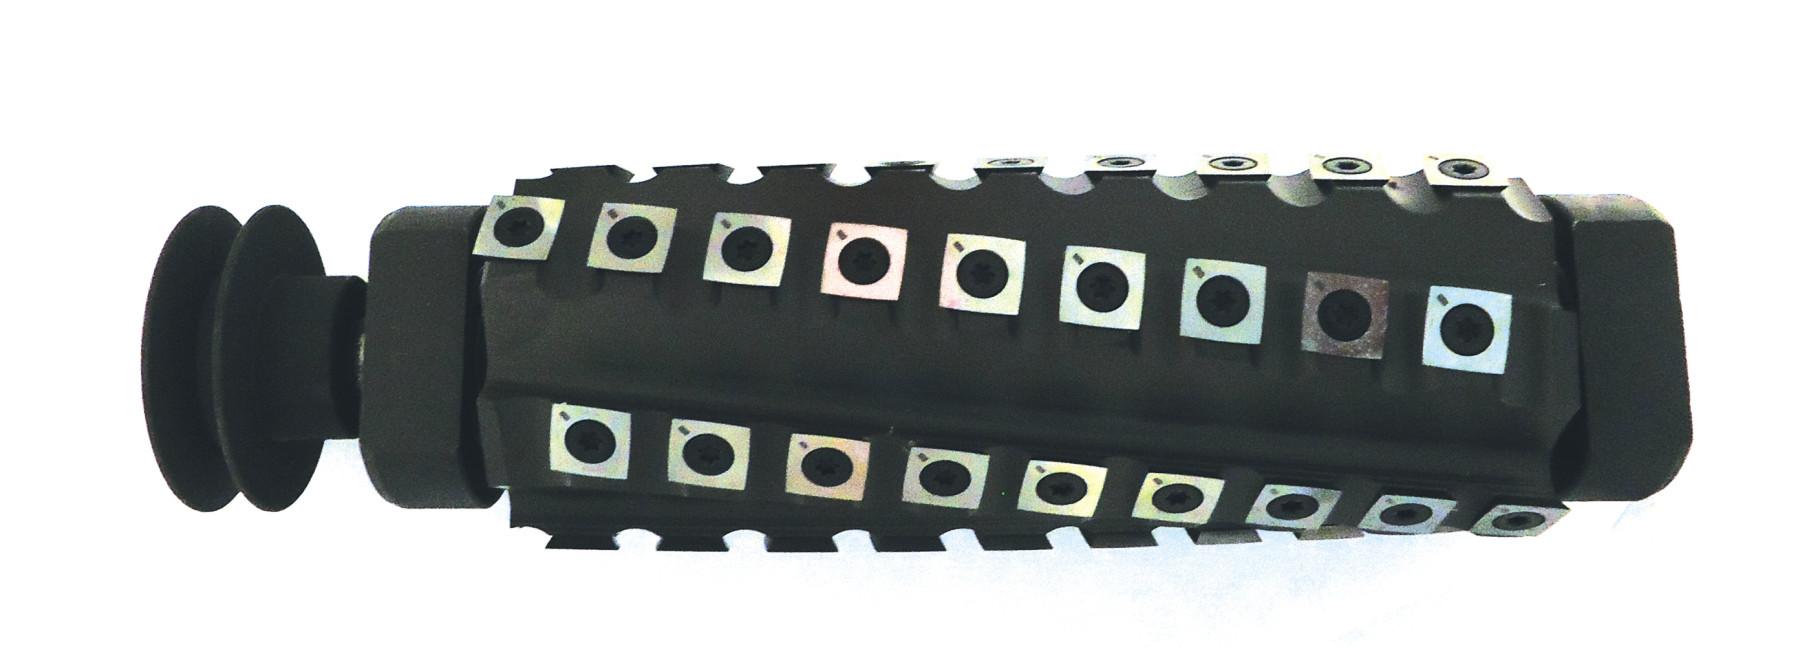 54A HH Фугувальний верстат з ножовим валом «helical» фото 5